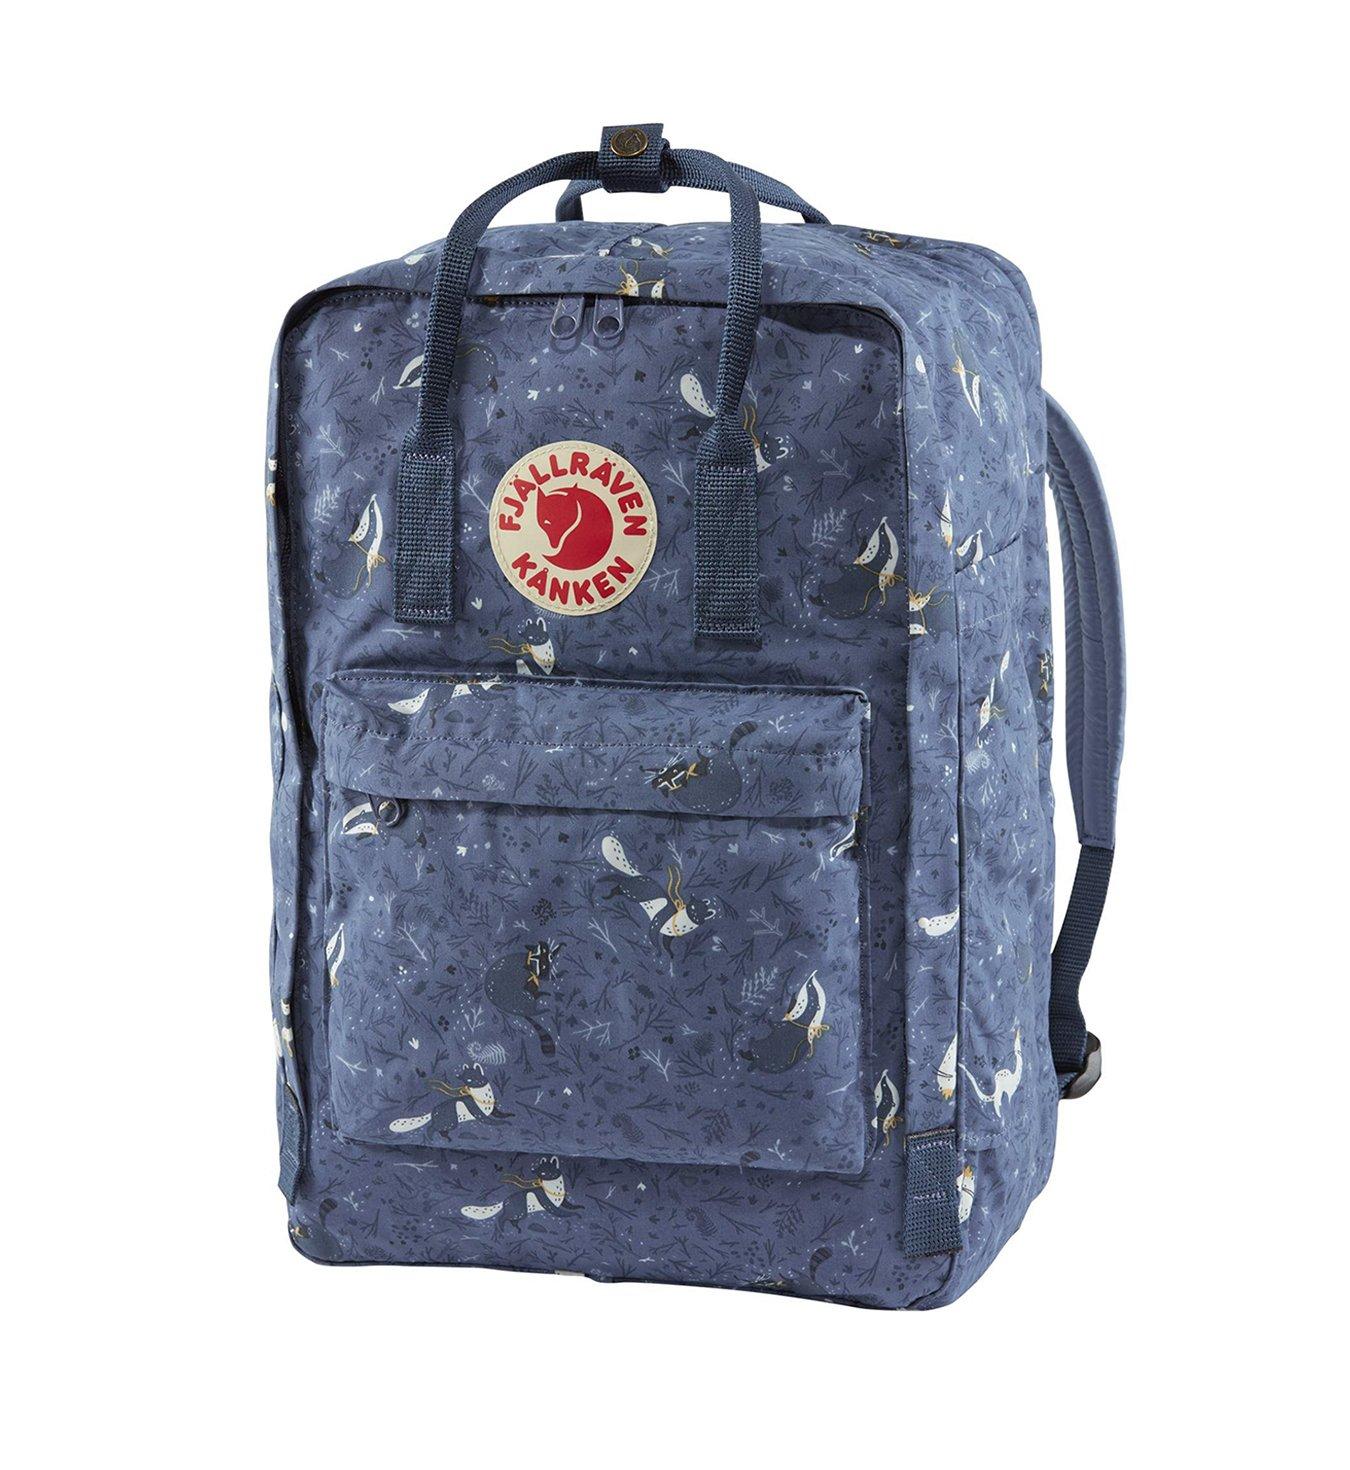 318abd6108eb1 Fjallraven Kanken Art Laptop 17 Blue Fable | MARKI \ FJALLRAVEN ...